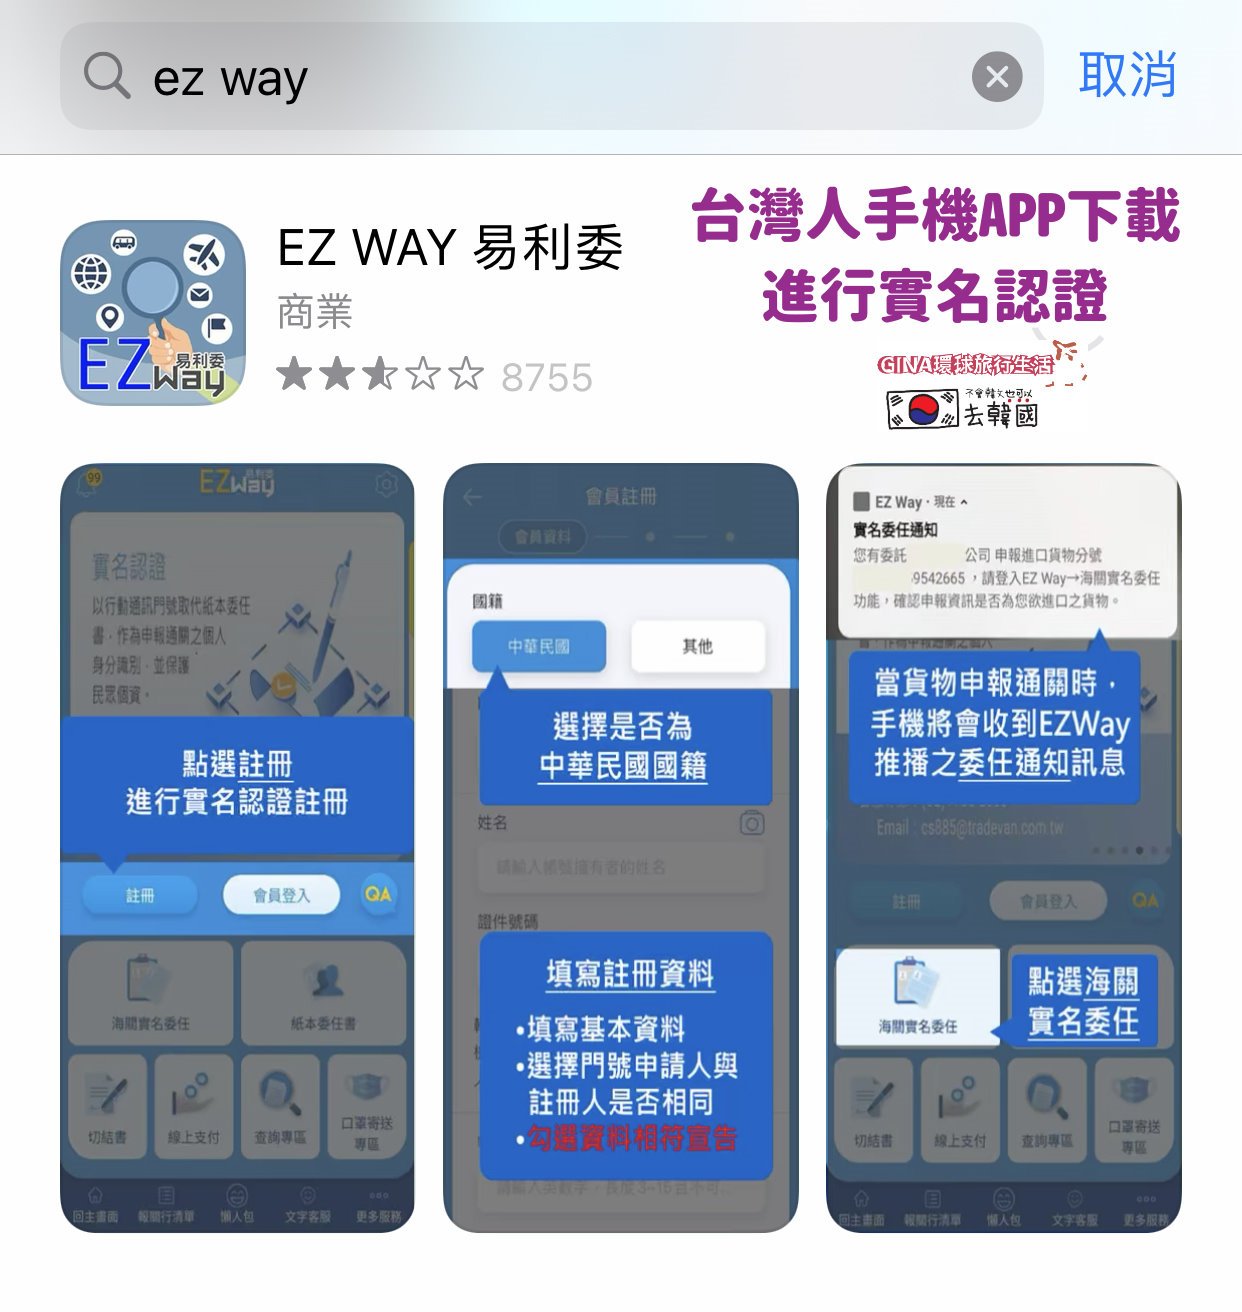 【EZ Way教學】1分鐘搞懂台灣報關稅軟體手機APP-易利委|快遞收貨人實名認證 @GINA環球旅行生活|不會韓文也可以去韓國